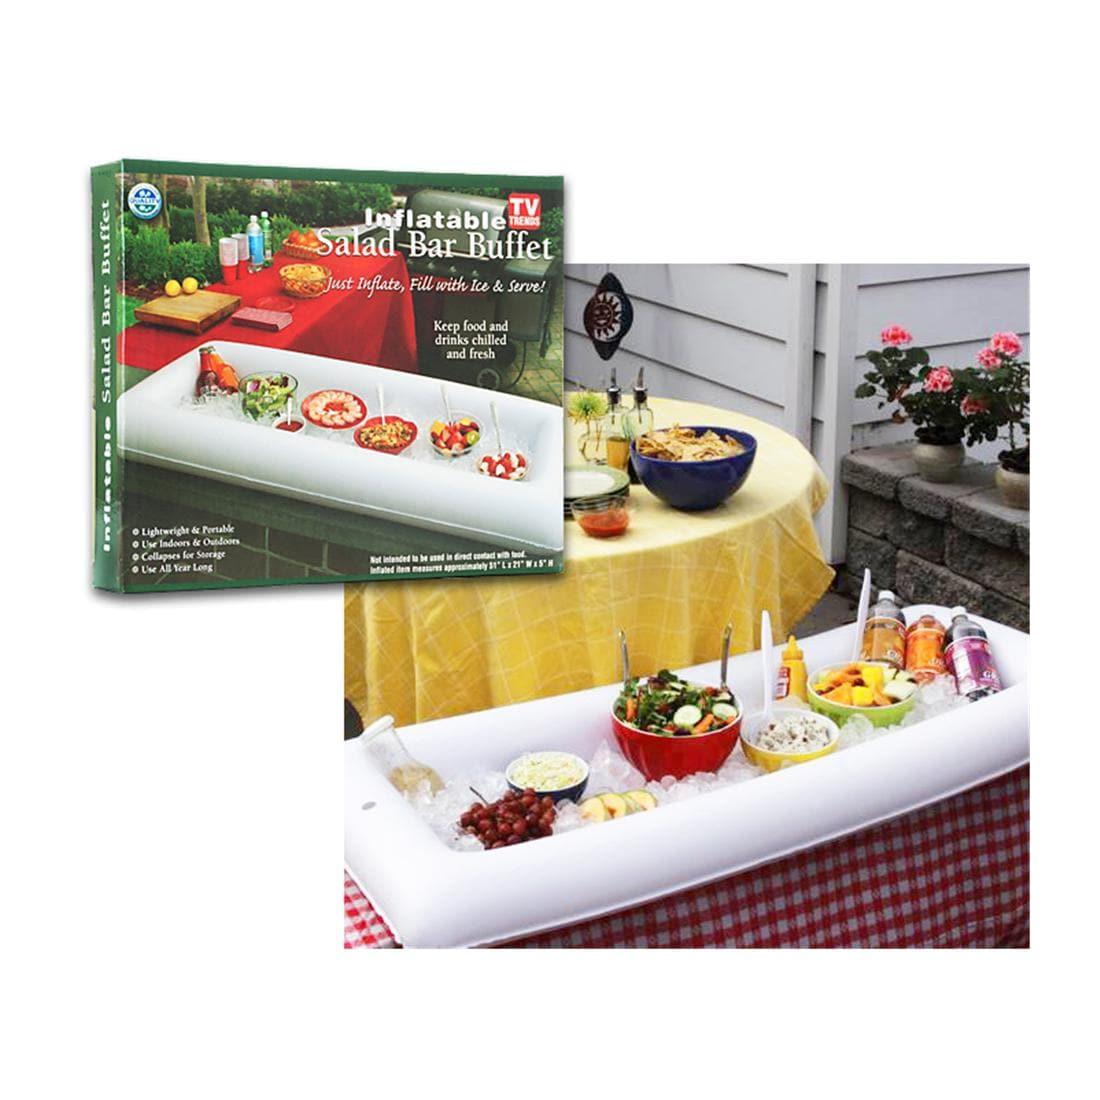 Inflatable Portable Buffet and Salad Bar Drink Cooler - Thumbnail 2